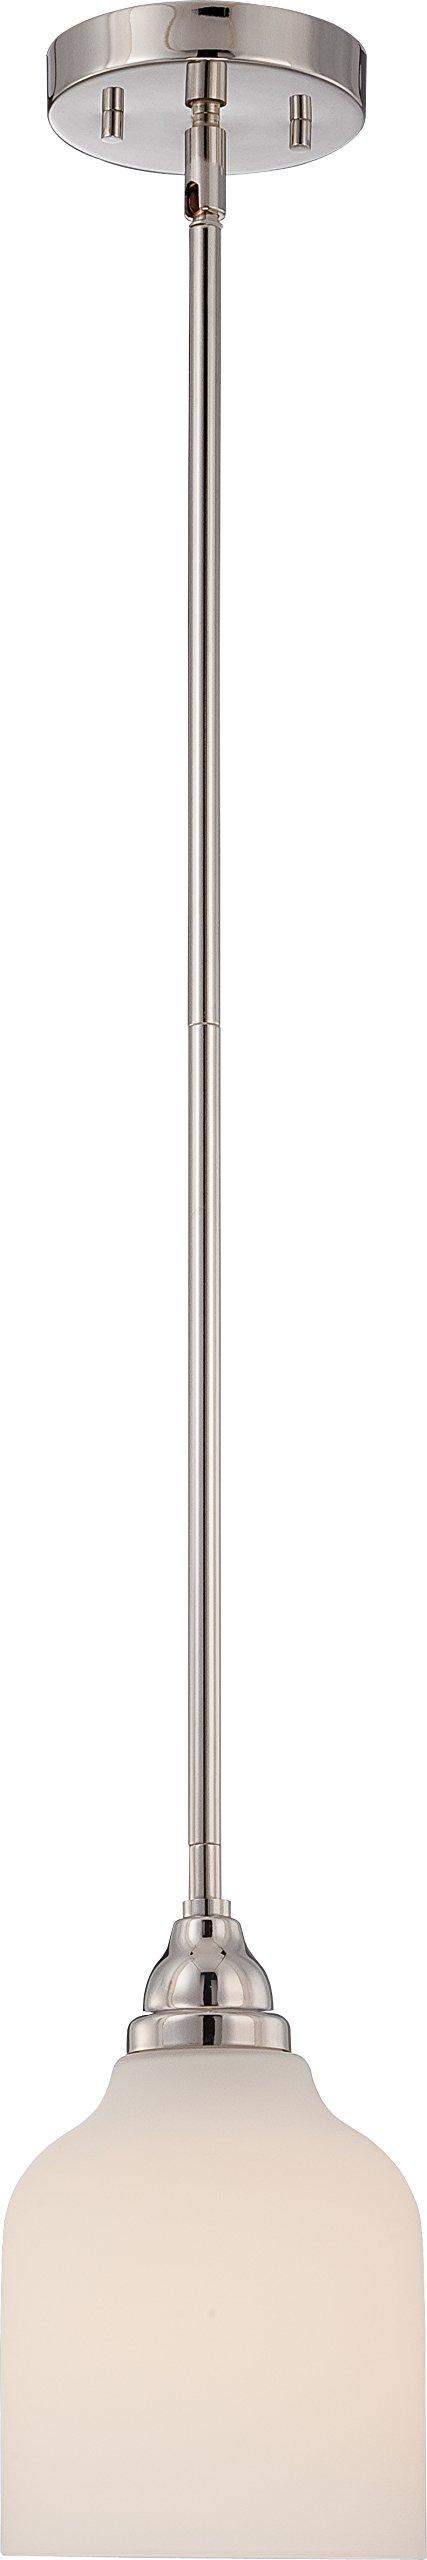 Nuvo Lighting 62/382 LED Mini Pendant by Nuvo Lighting (Image #1)